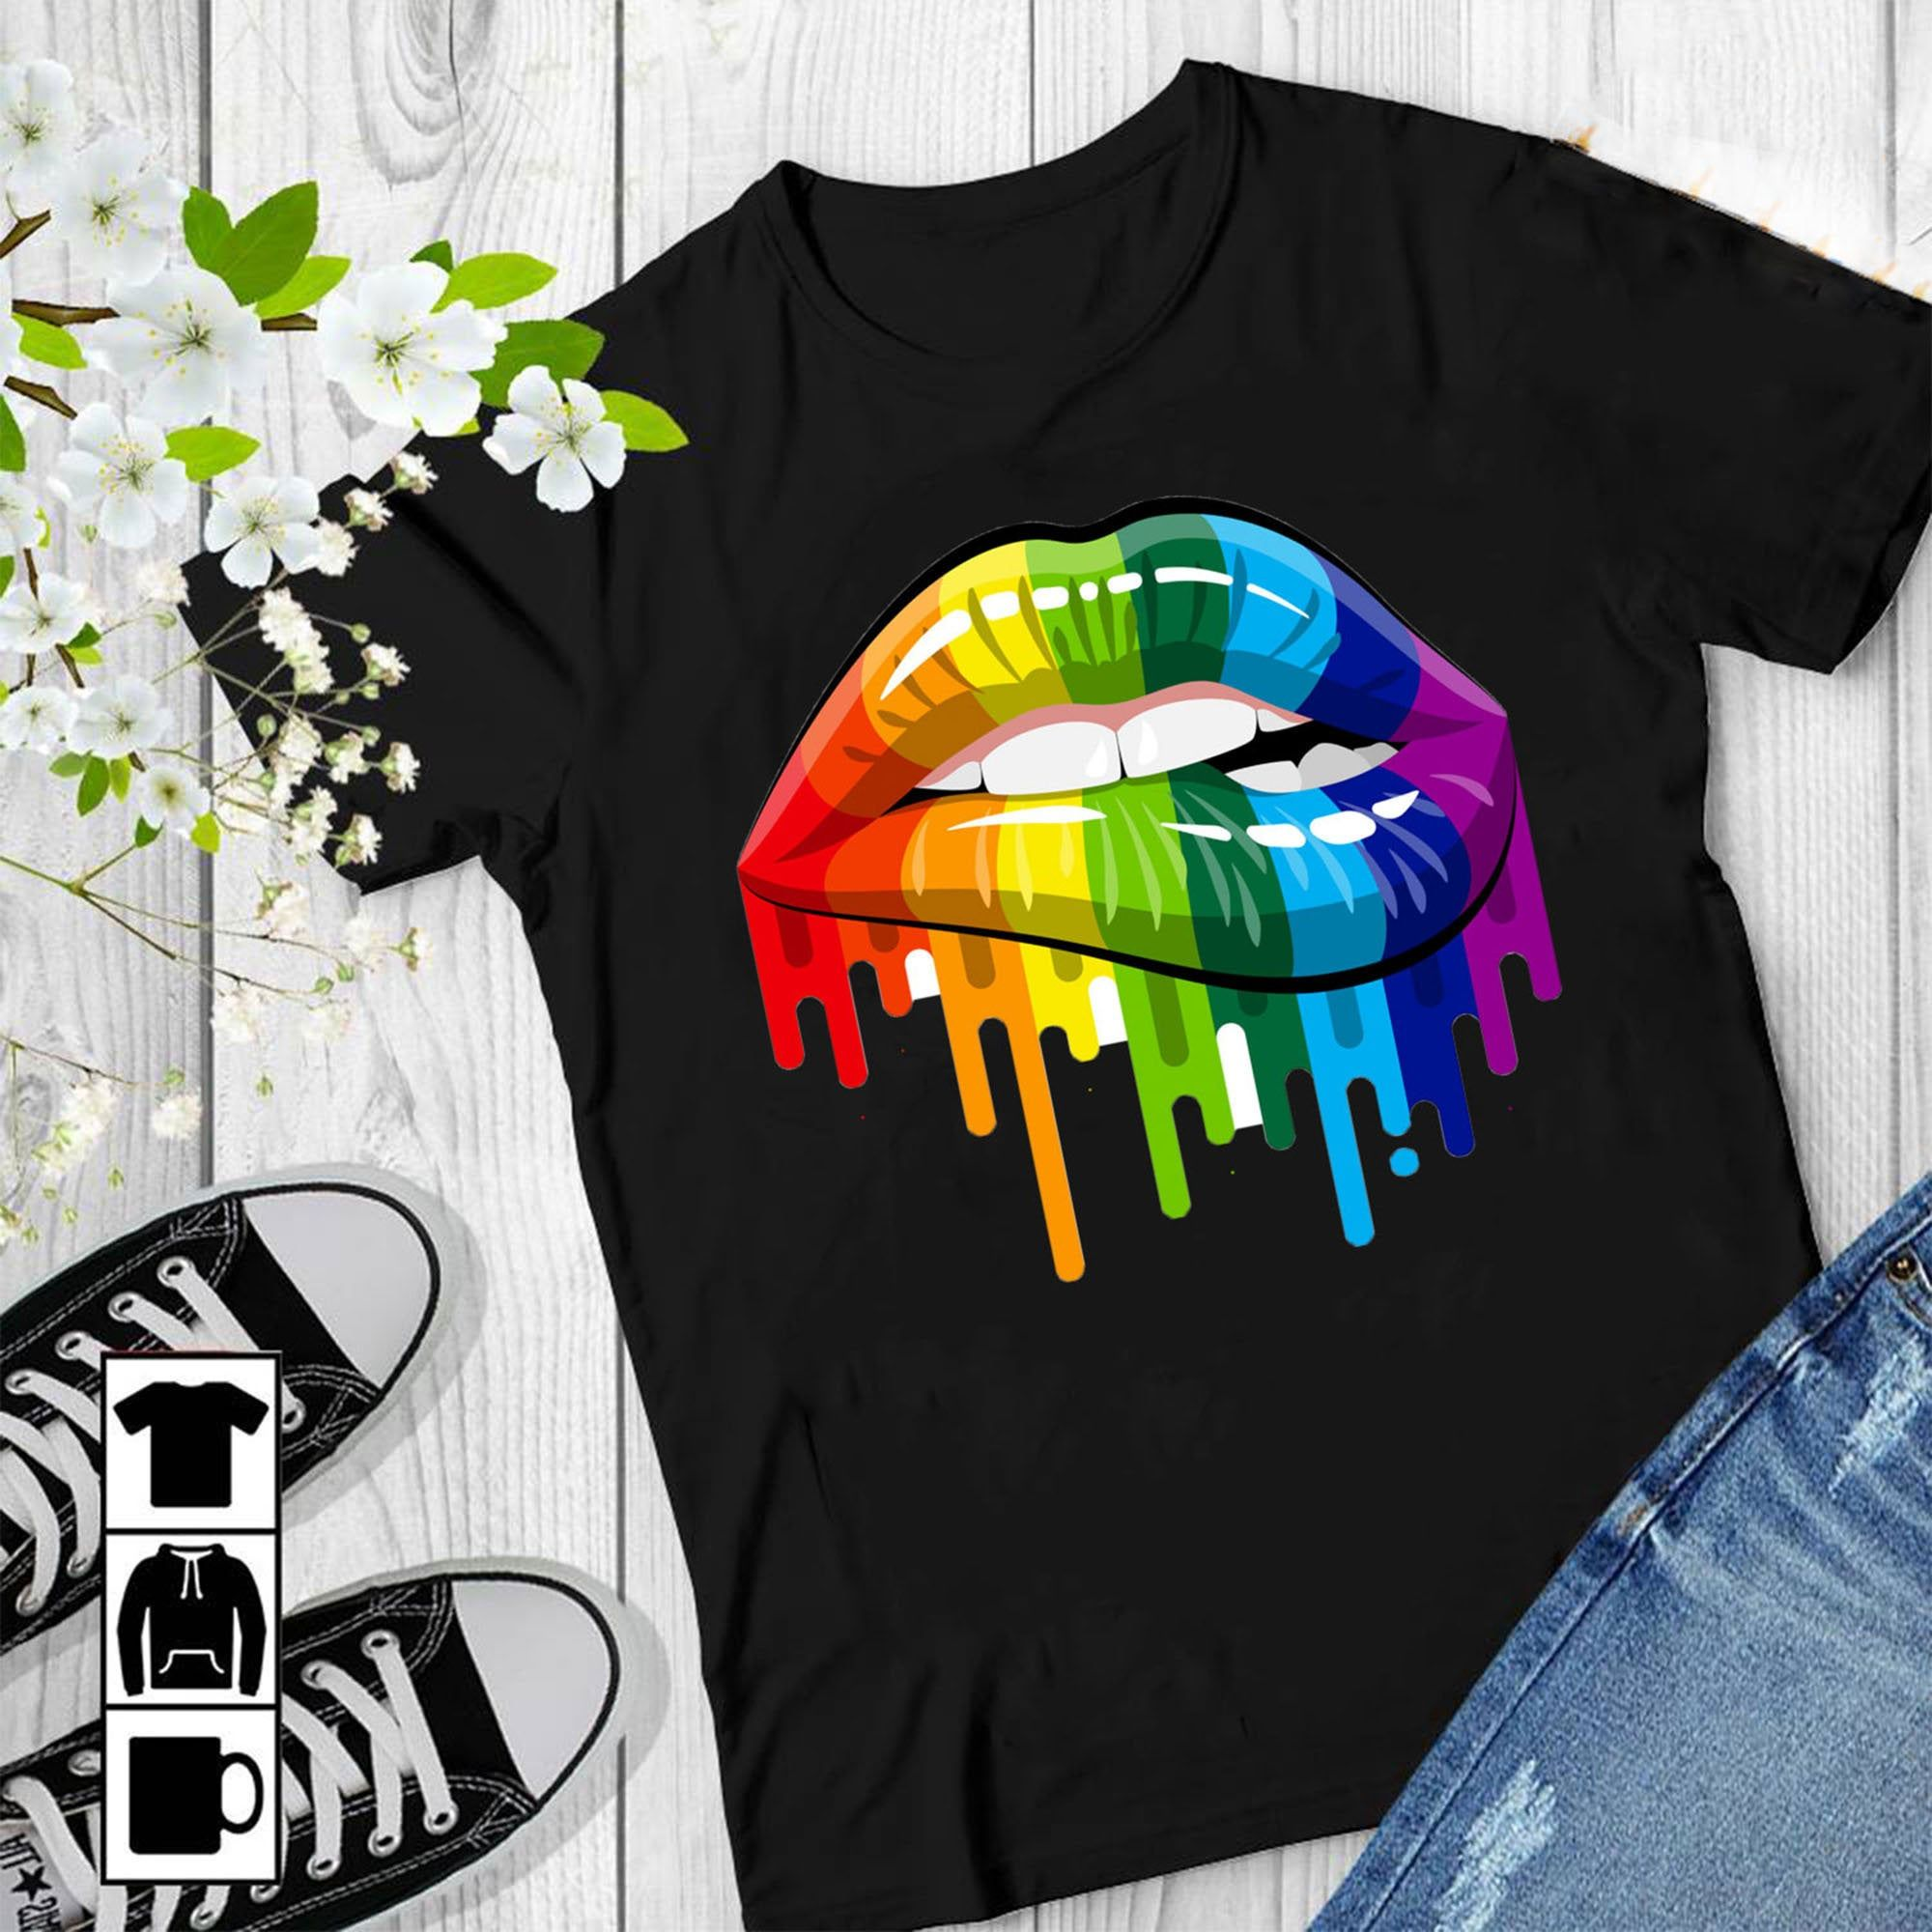 Bigger Problems T-Shirt lgbtq gay pride heart lesbian bi ladies scoop neck